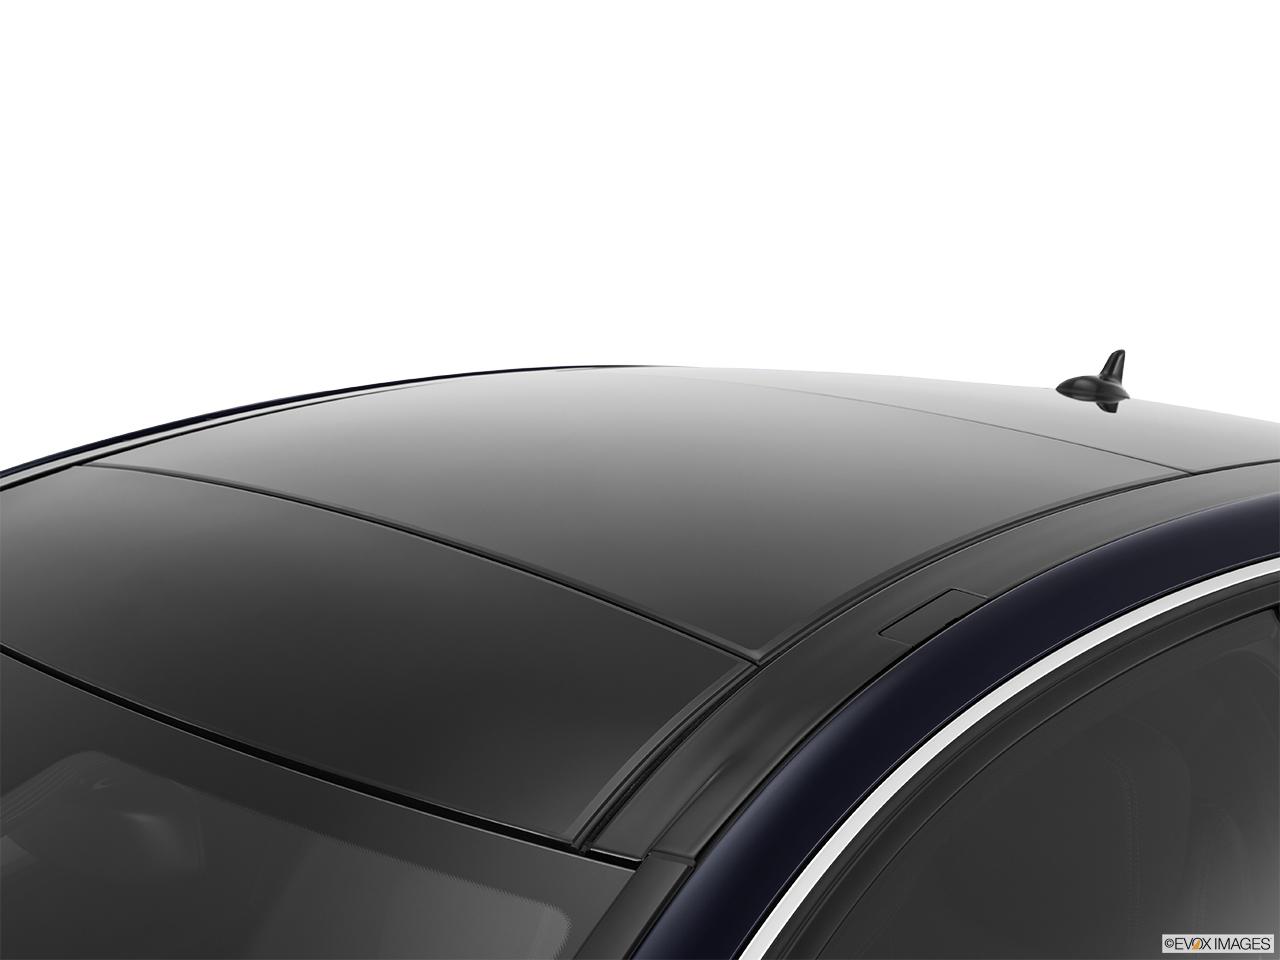 2014 Mercedes-Benz C-Class Coupe C350 4MATIC - Sunroof/moonroof